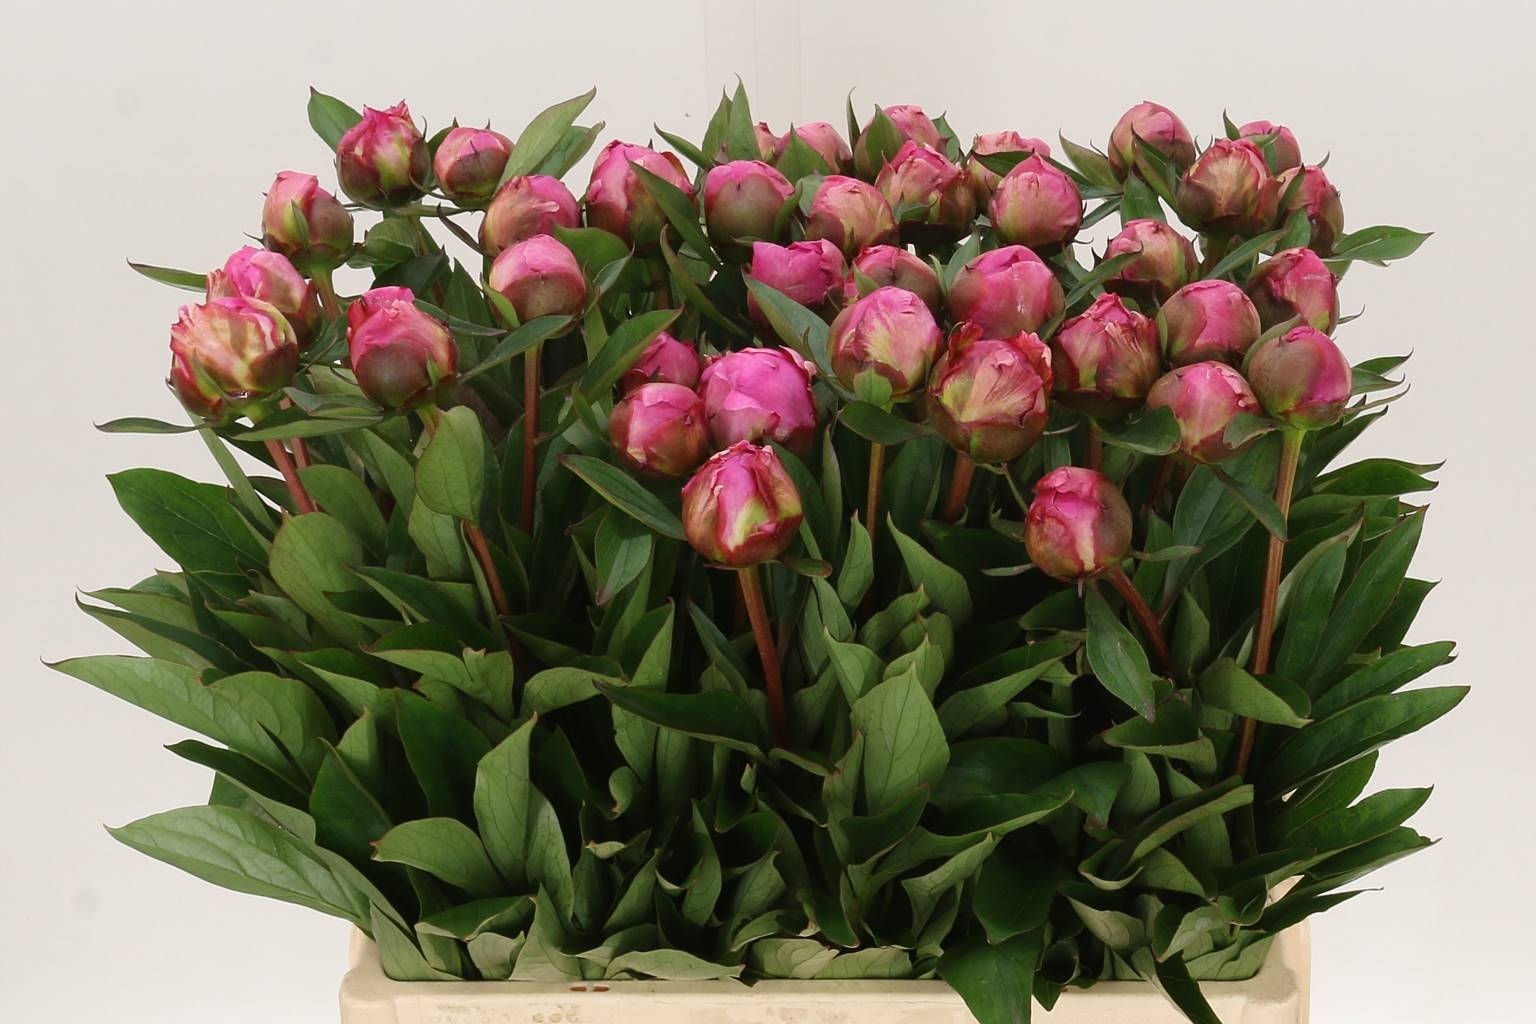 Paeonia dr alexander fleming( Пион др Александр Флеминг) В60